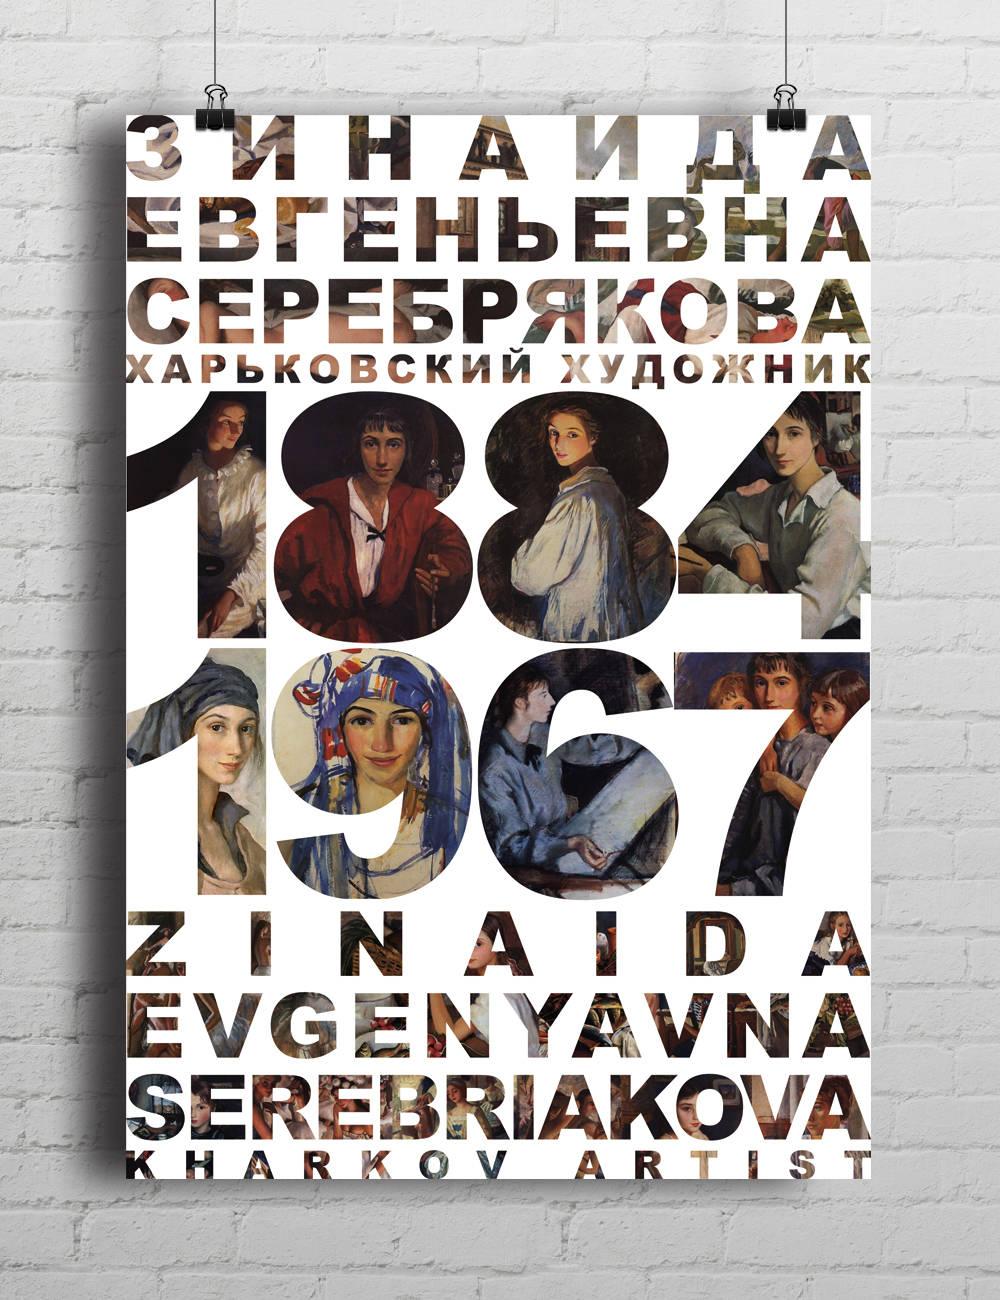 Posters by Zinaida Serebriakova